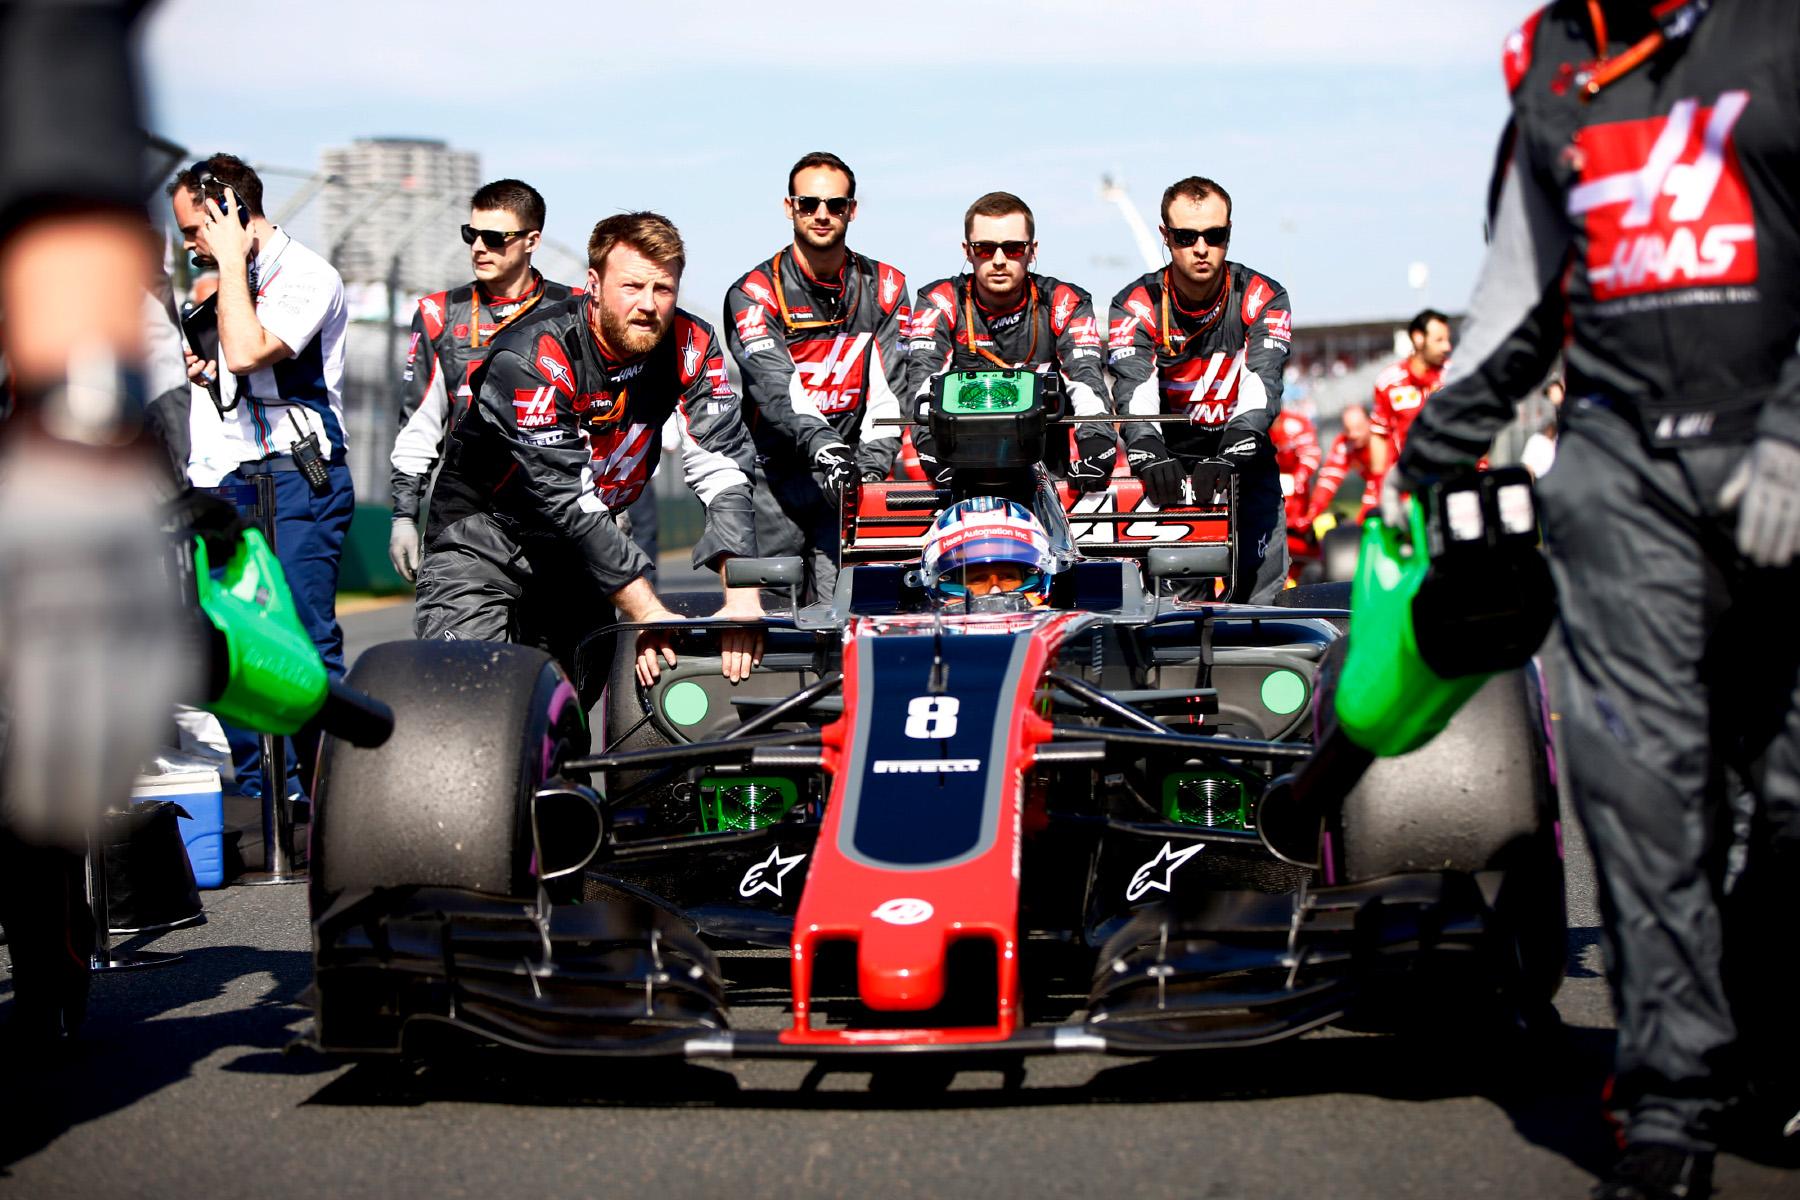 Romain Grosjean is wheeled in his car to the grid.